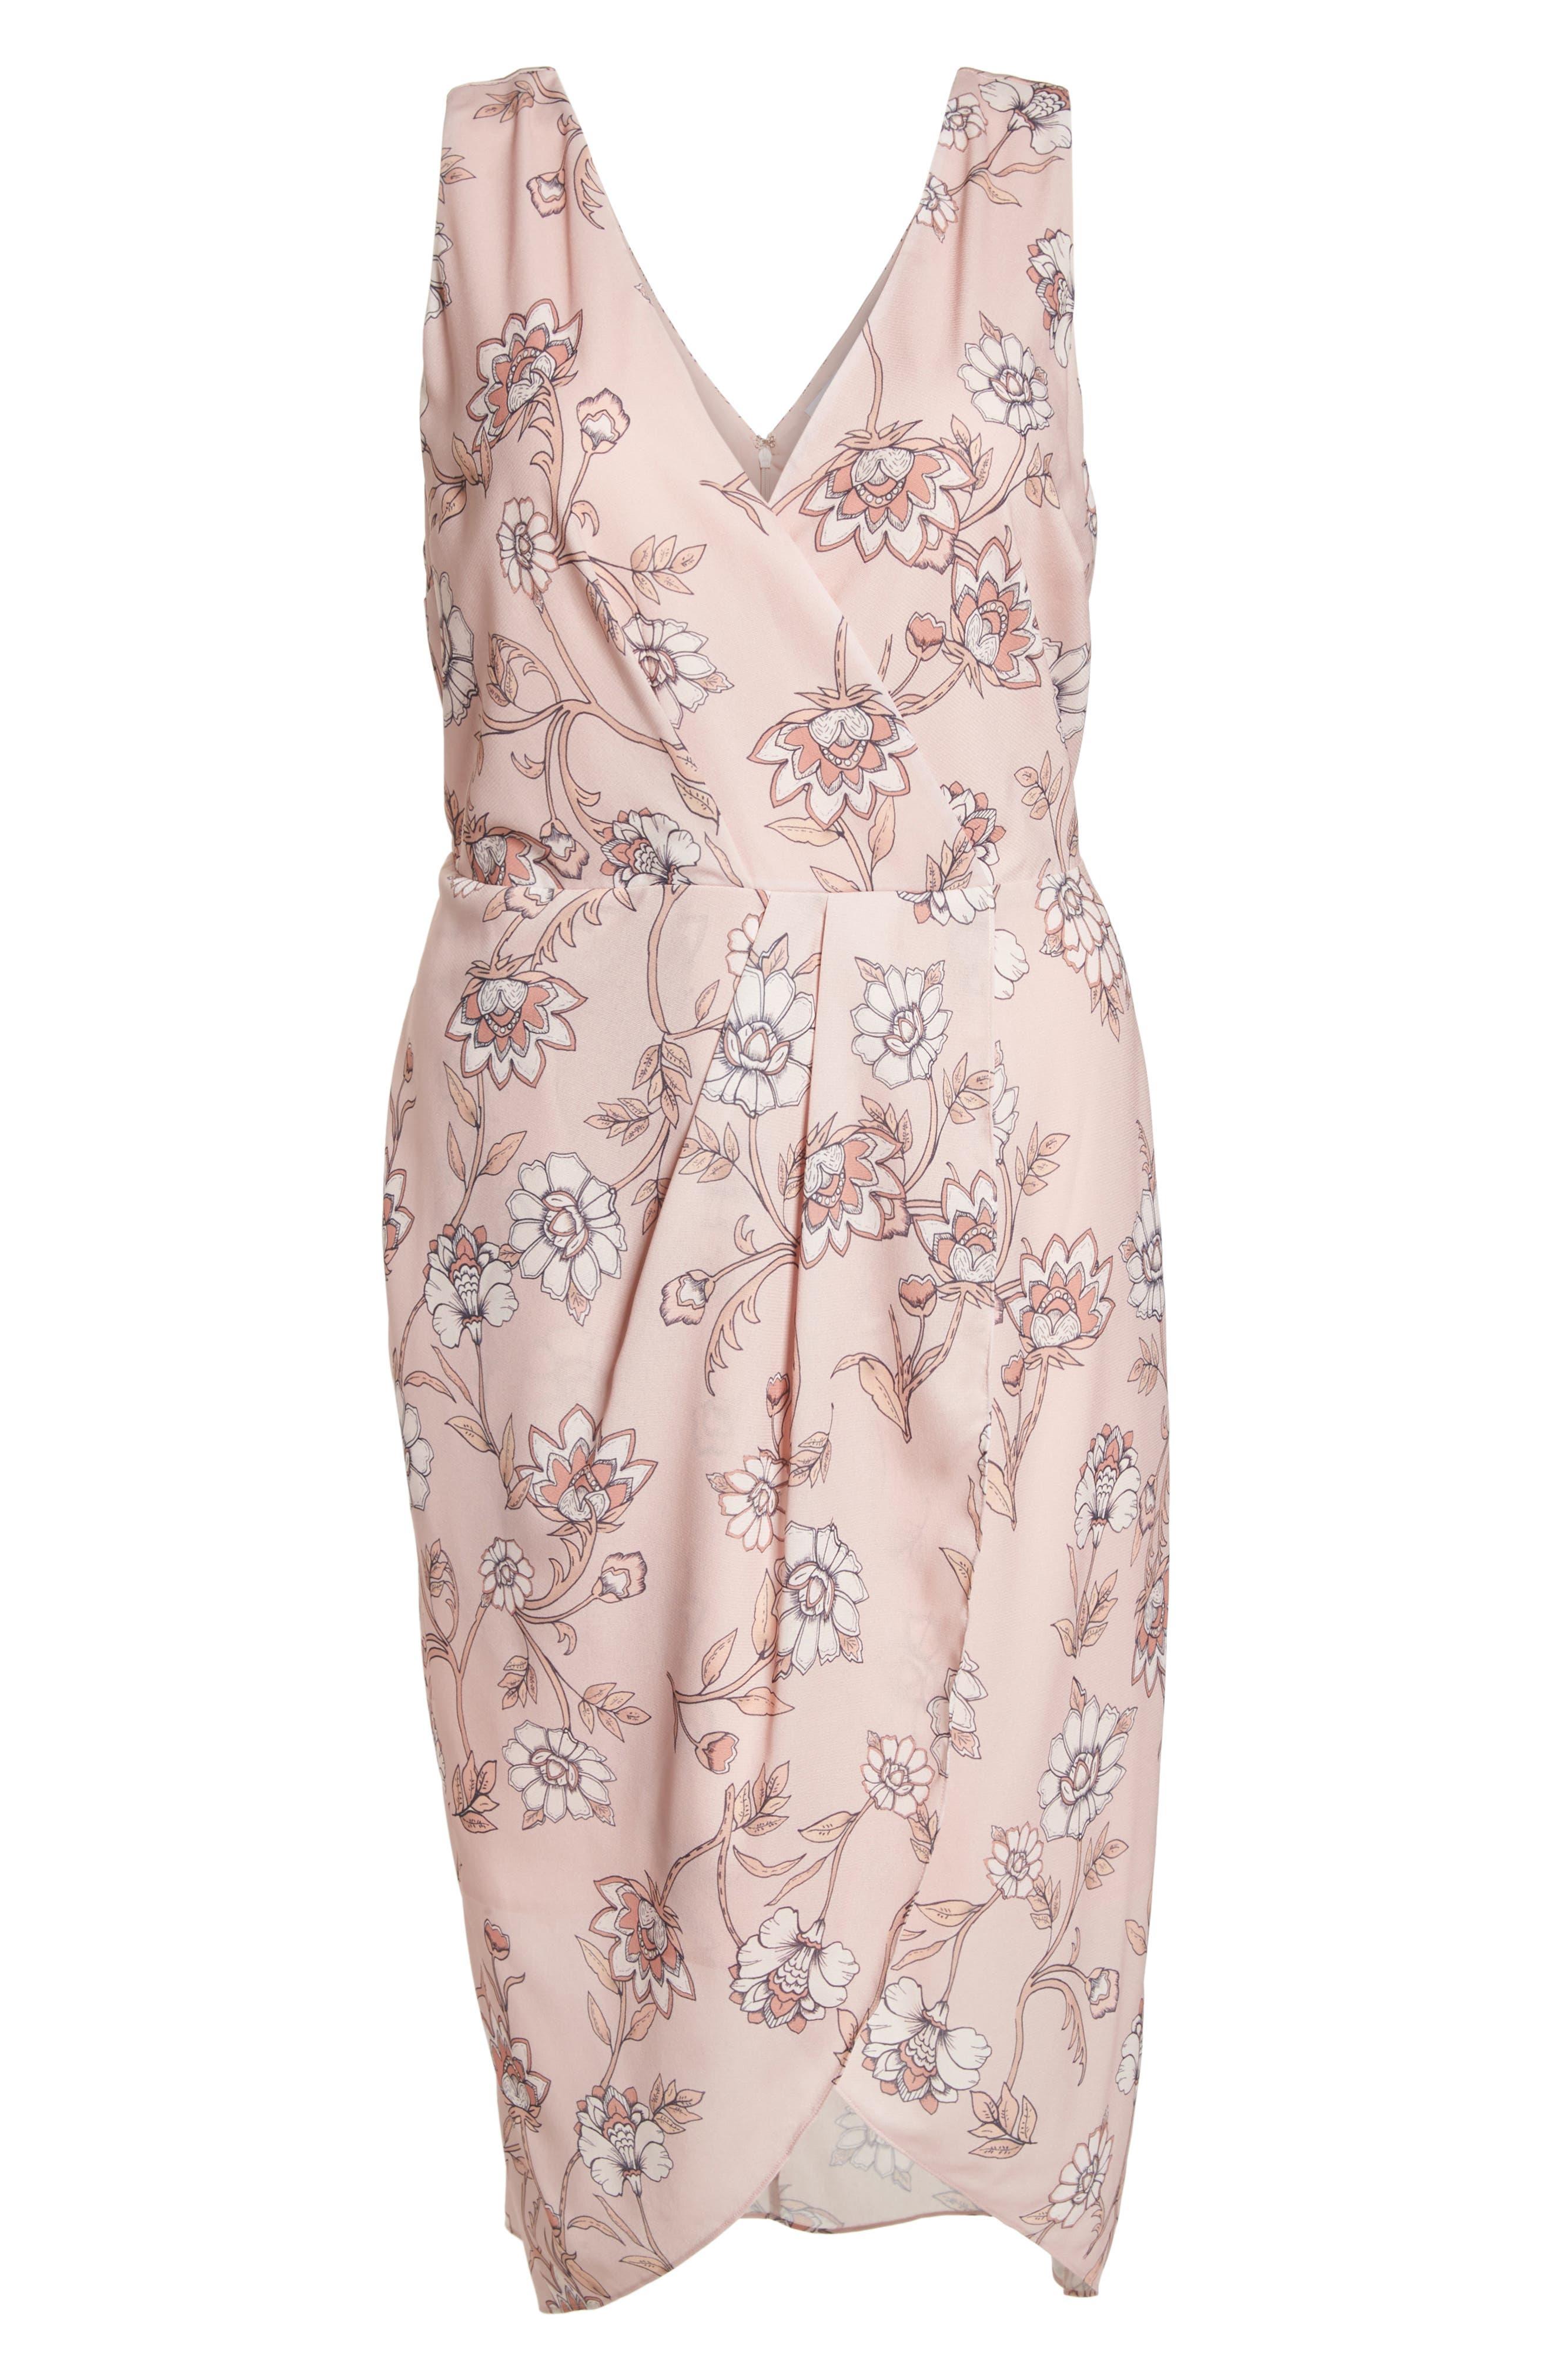 Fiorella Floral Drape Sheath Dress,                             Alternate thumbnail 7, color,                             650